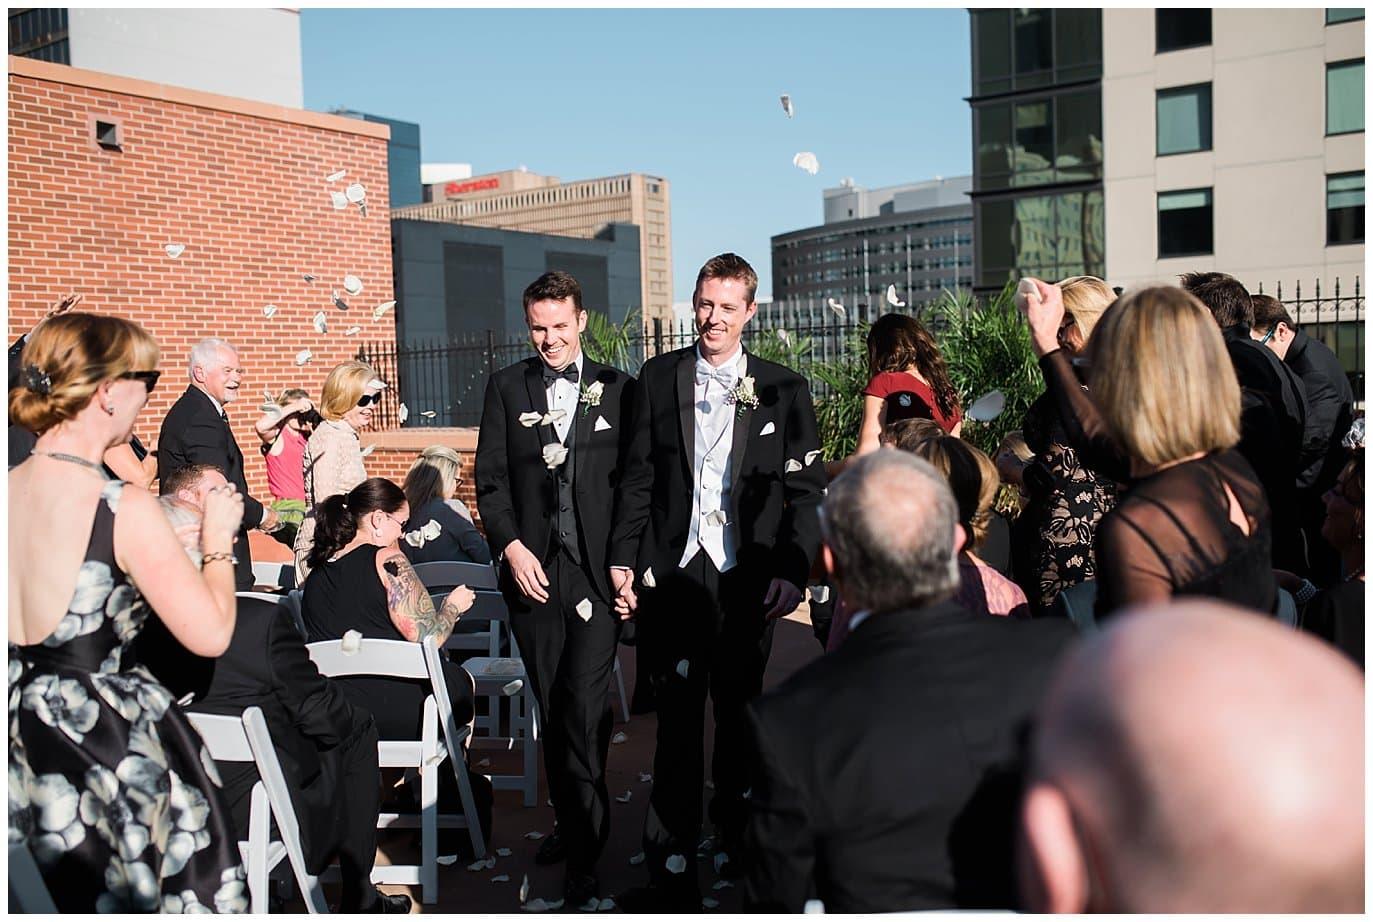 Denver Athletic Club same-sex wedding photo